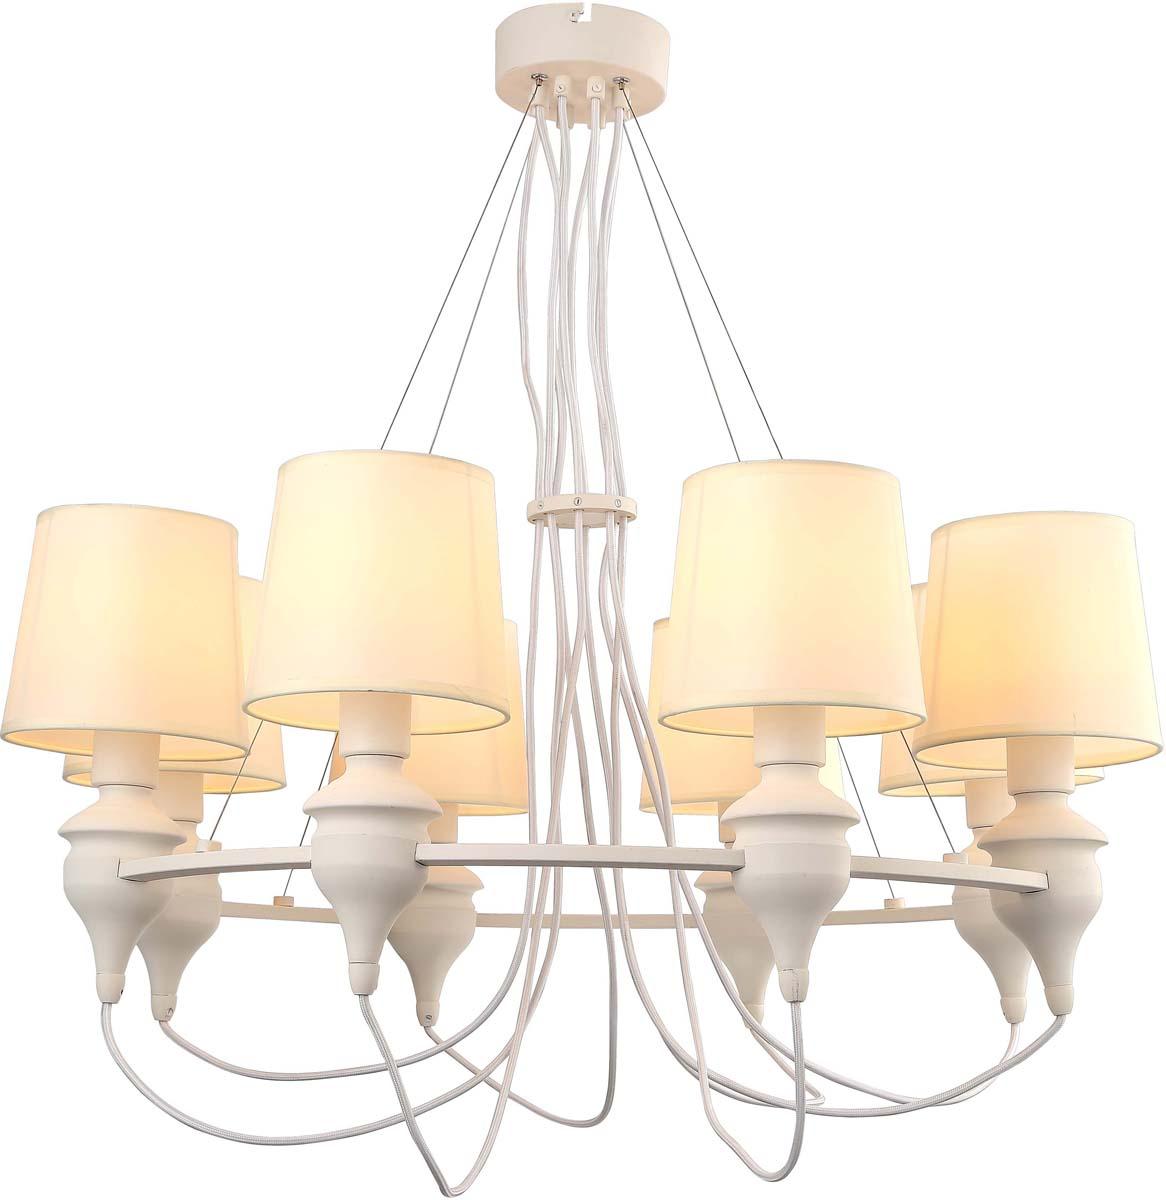 Светильник подвесной Arte Lamp Sergio, 8 х E14, 40 W. A3326LM-8WHA3326LM-8WH